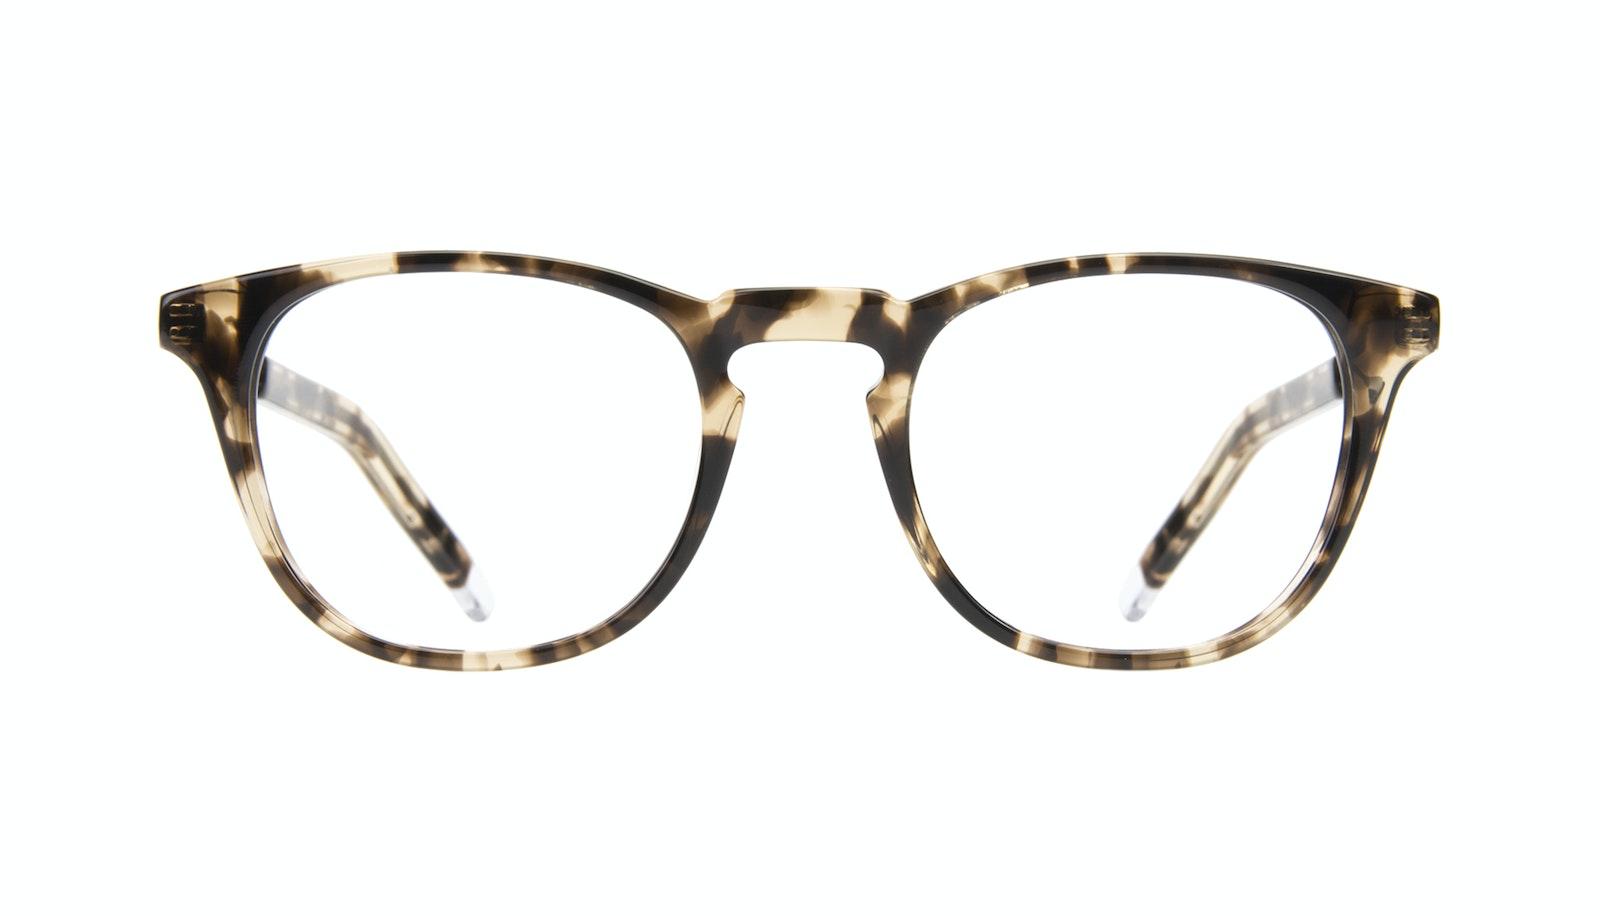 Affordable Fashion Glasses Rectangle Square Eyeglasses Men Sturdy Gold Tort